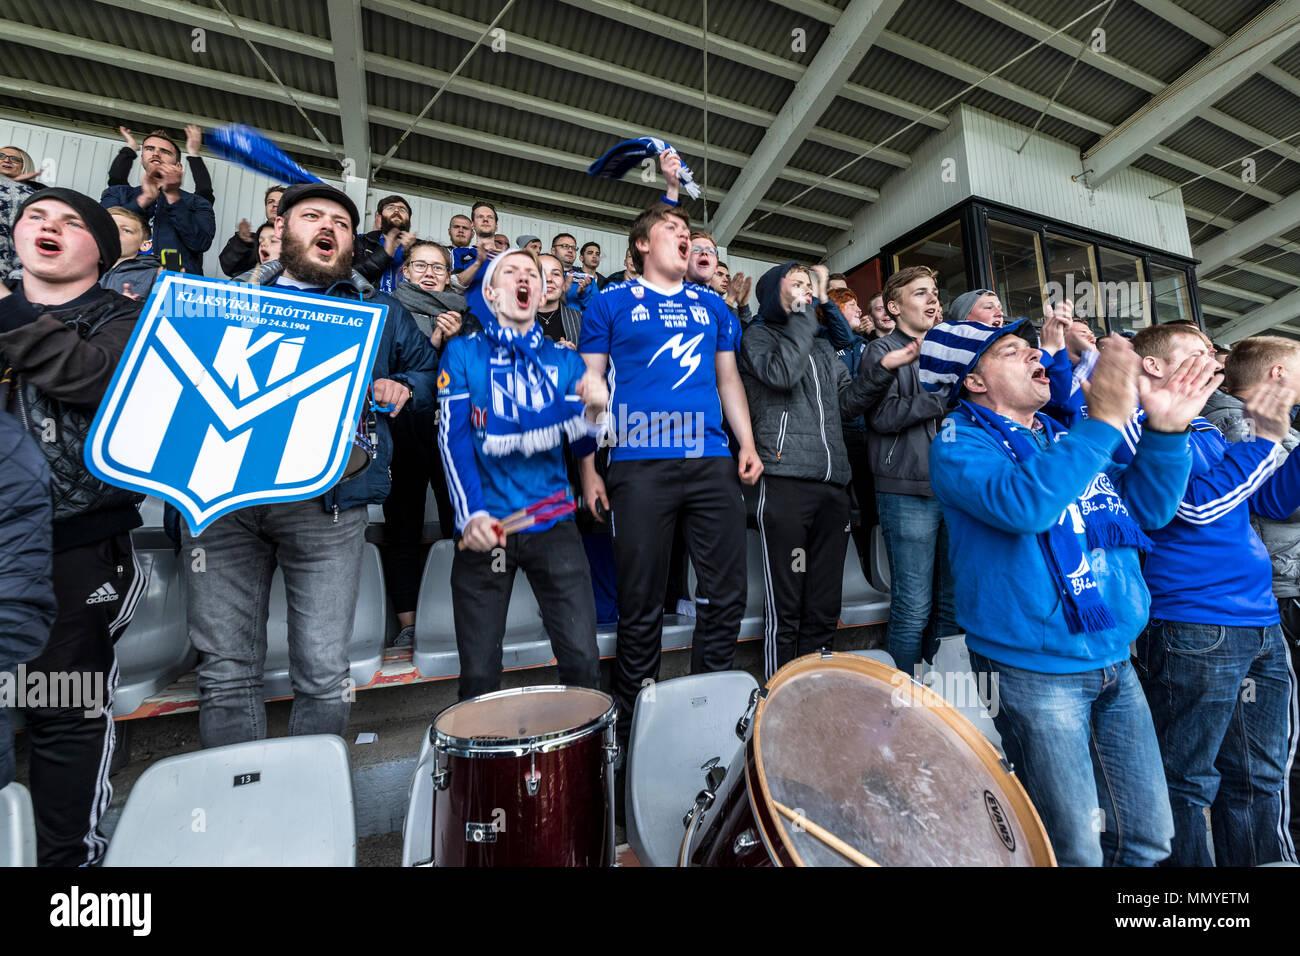 Anhänger der Klaksvik Team im Fußball-Stadion, Torshavn, Streymoy Island, Färöer Inseln Stockbild